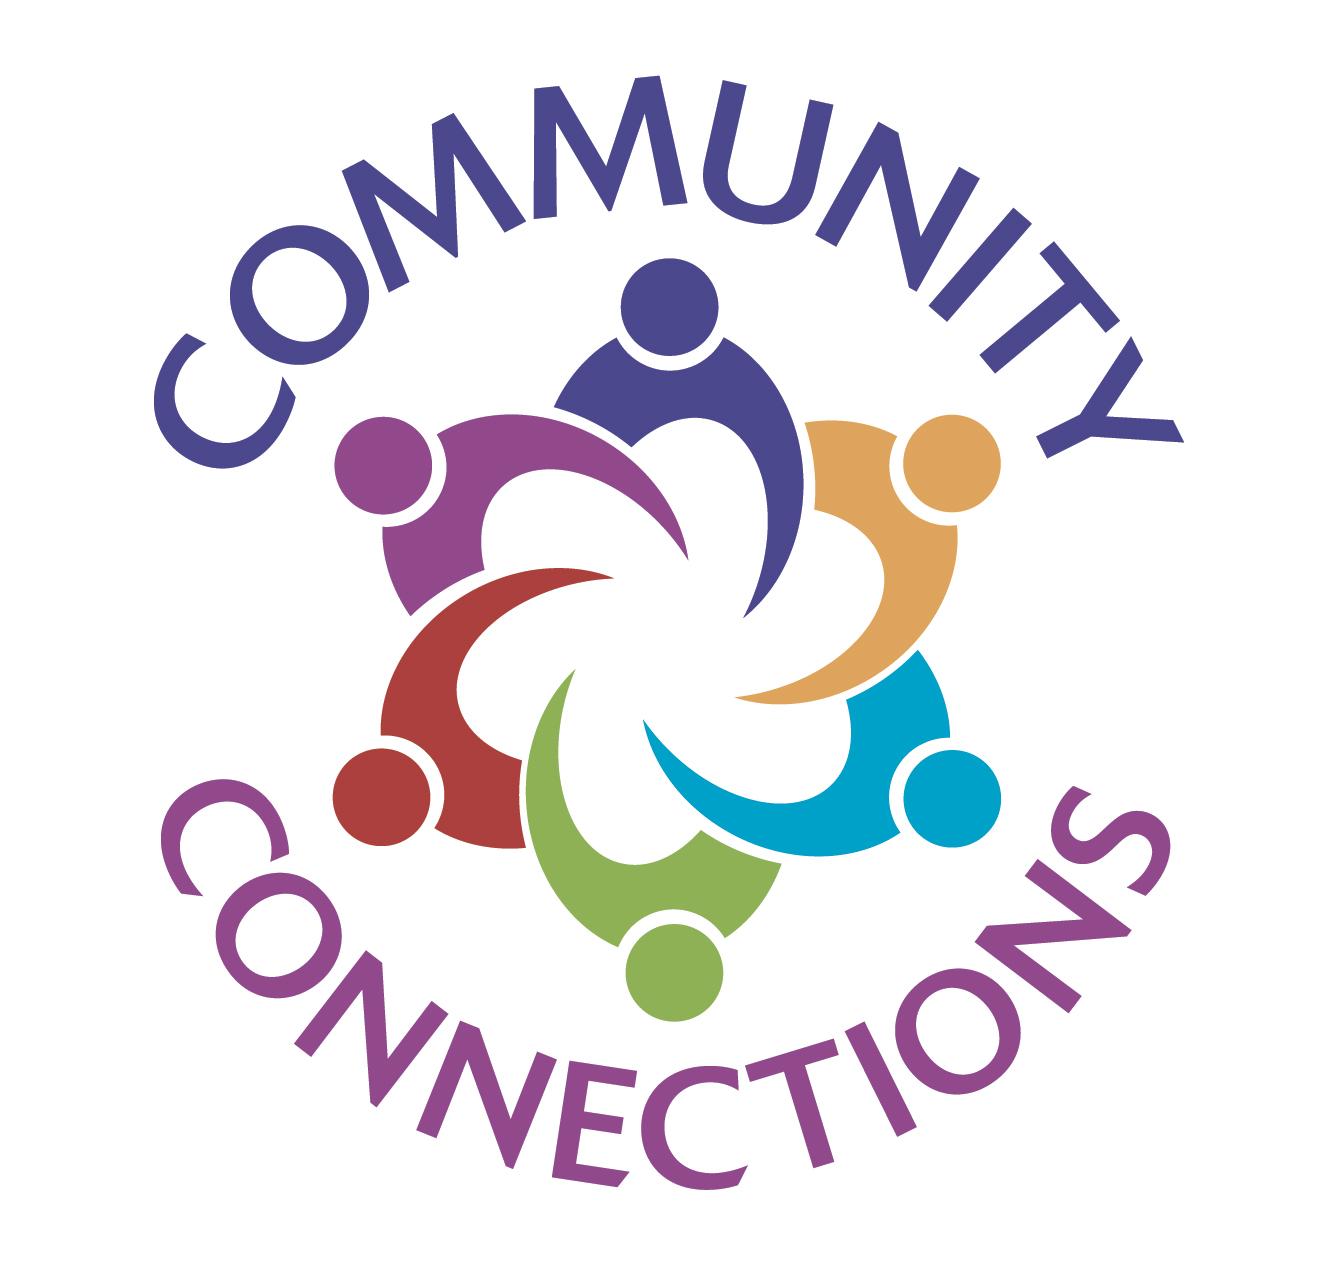 Project Management Experts Help M O M Launch Community